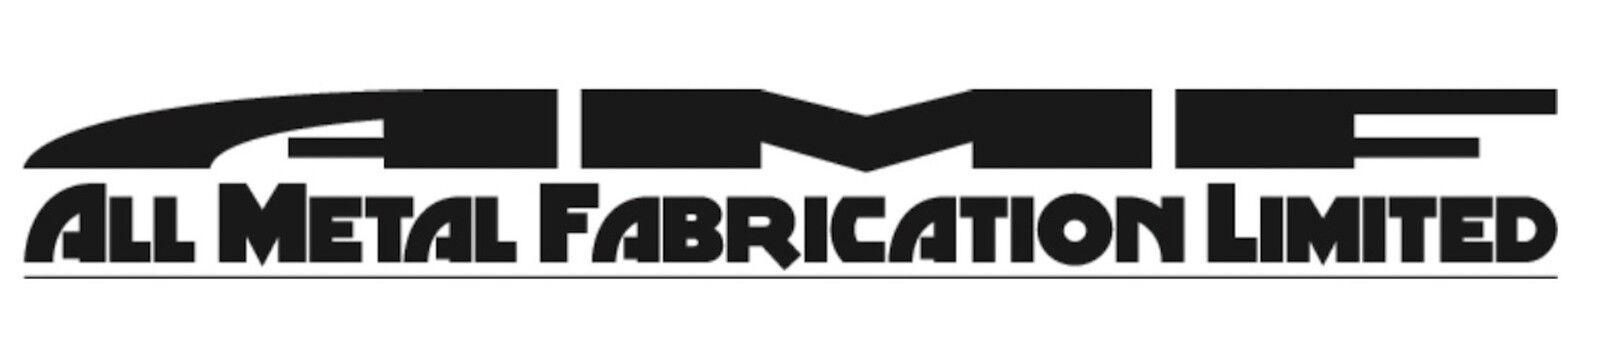 all_metal_fabrication